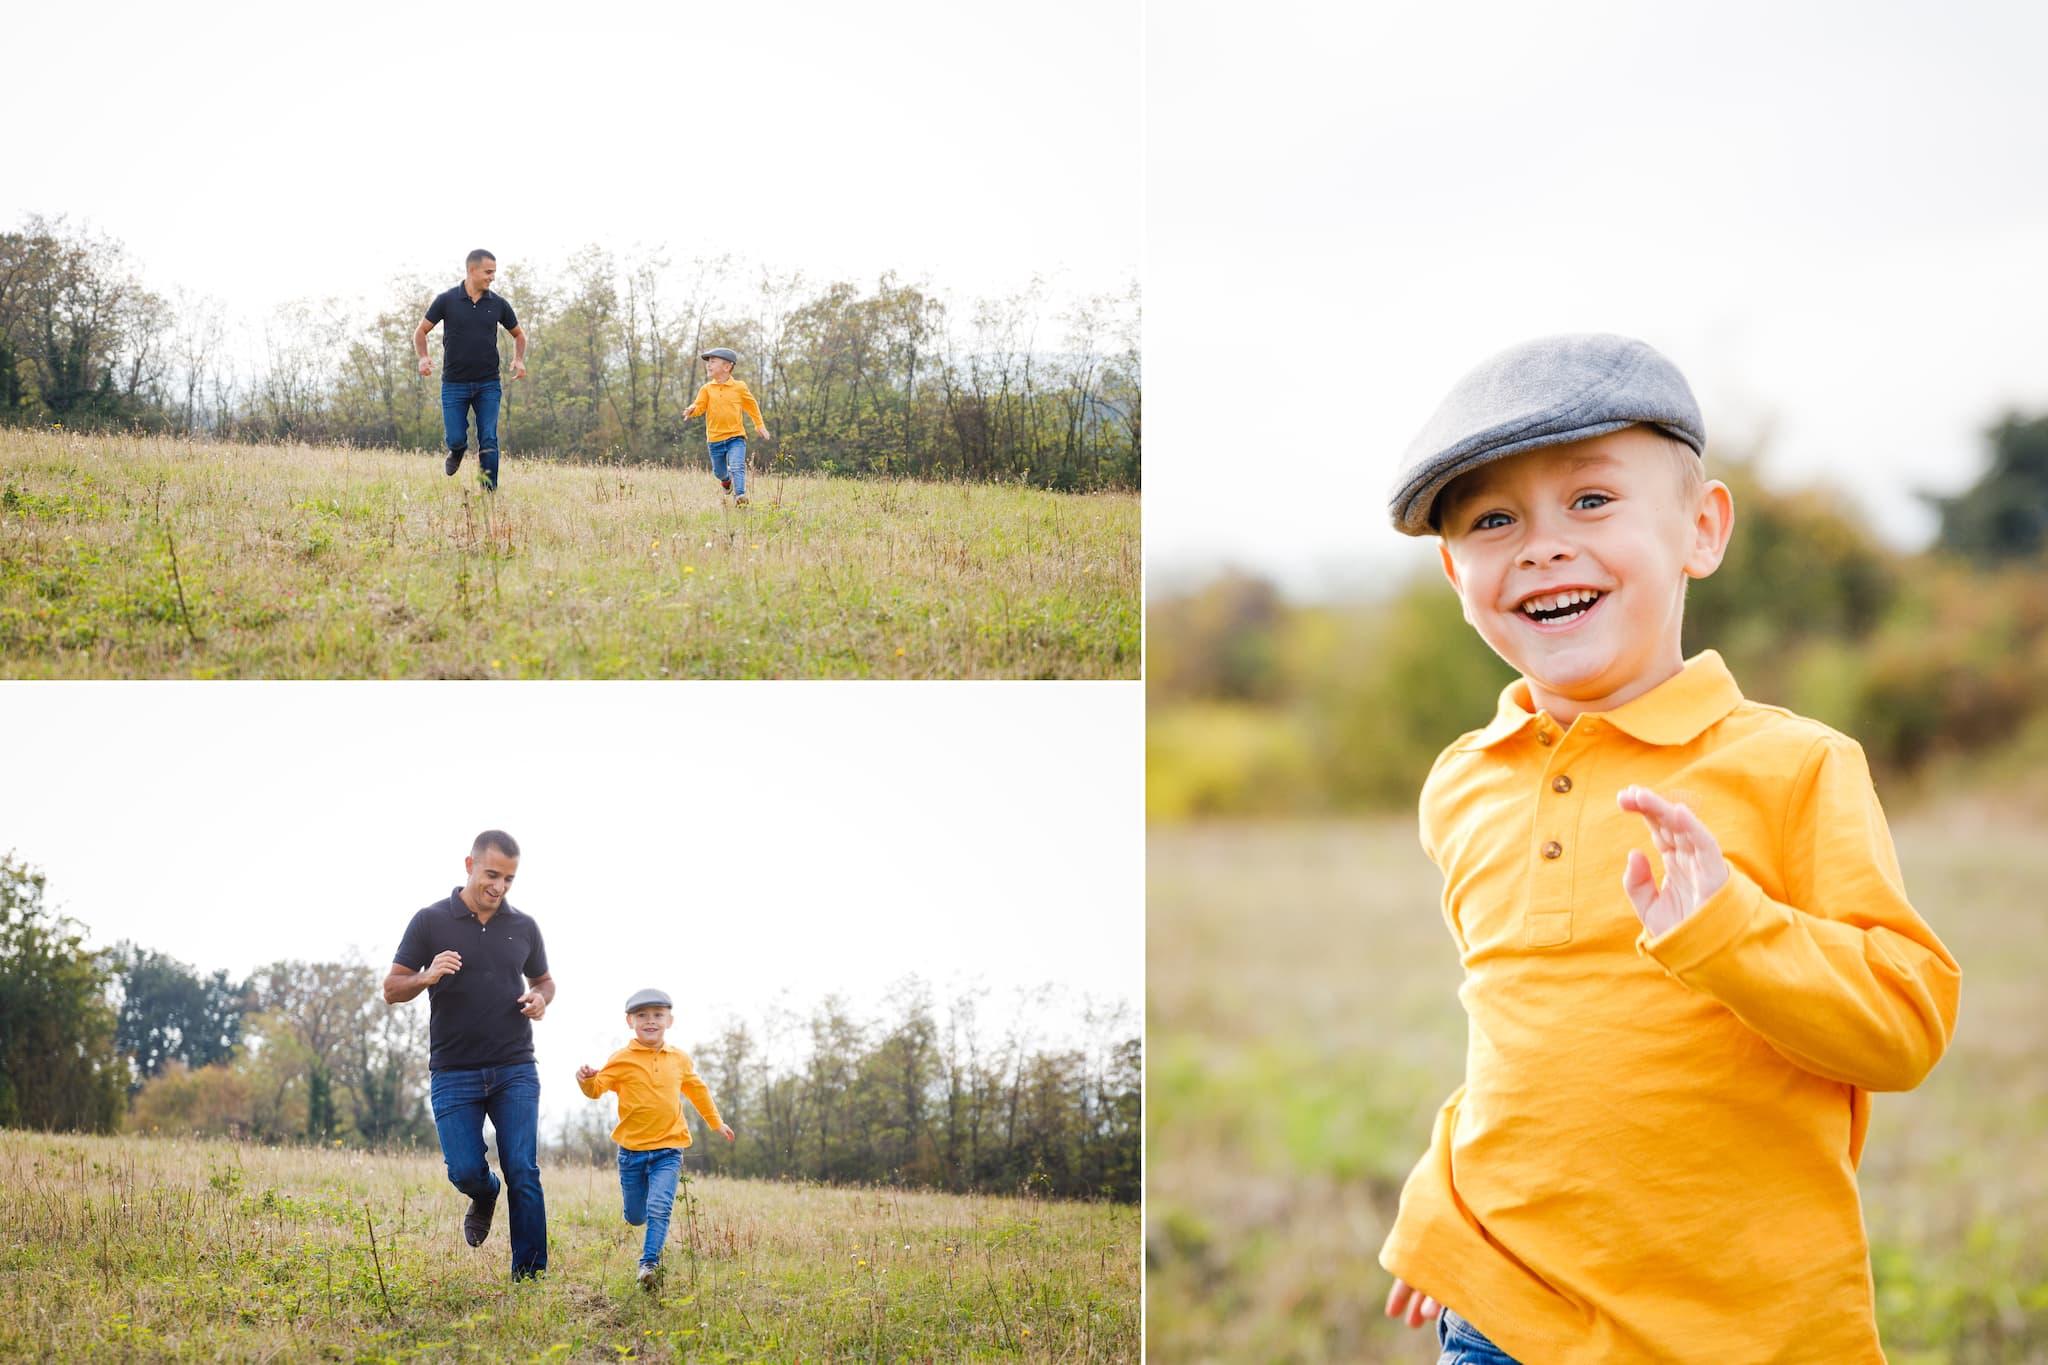 lyon ; photographe de famille ; photographe de mariage